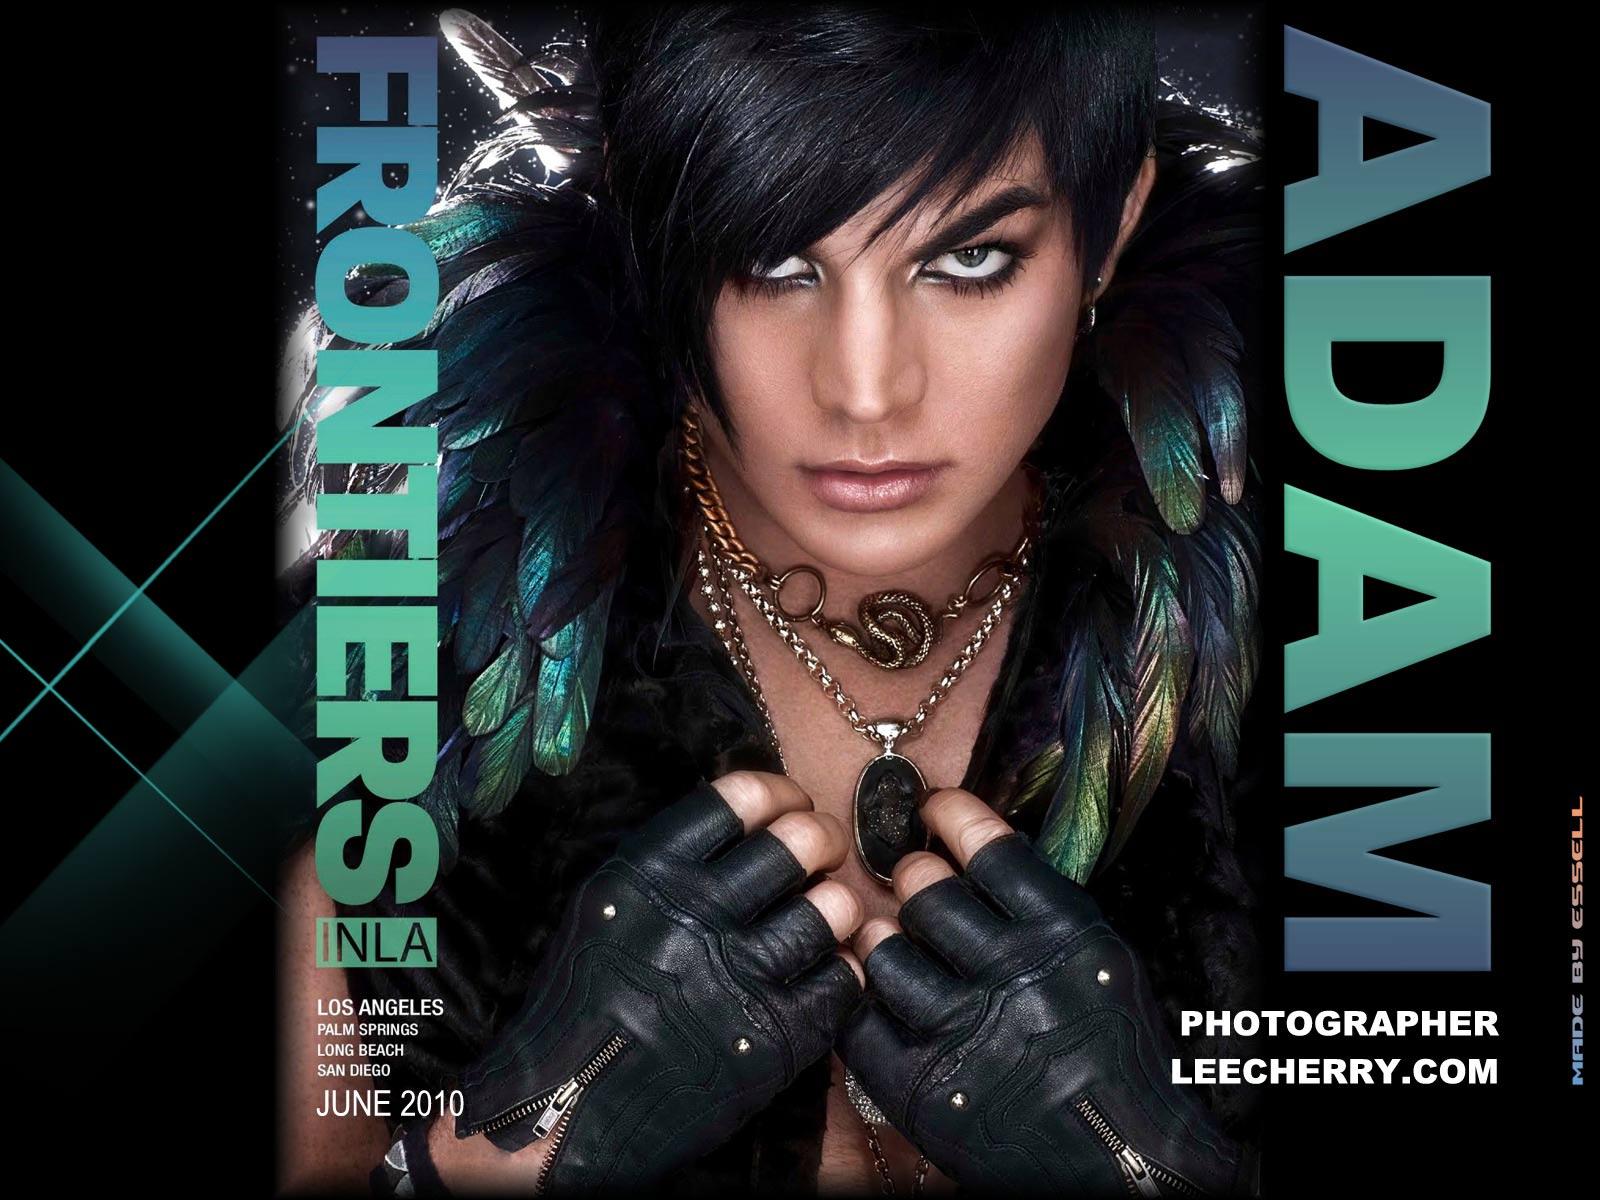 Adam lambert glam nation live album free download